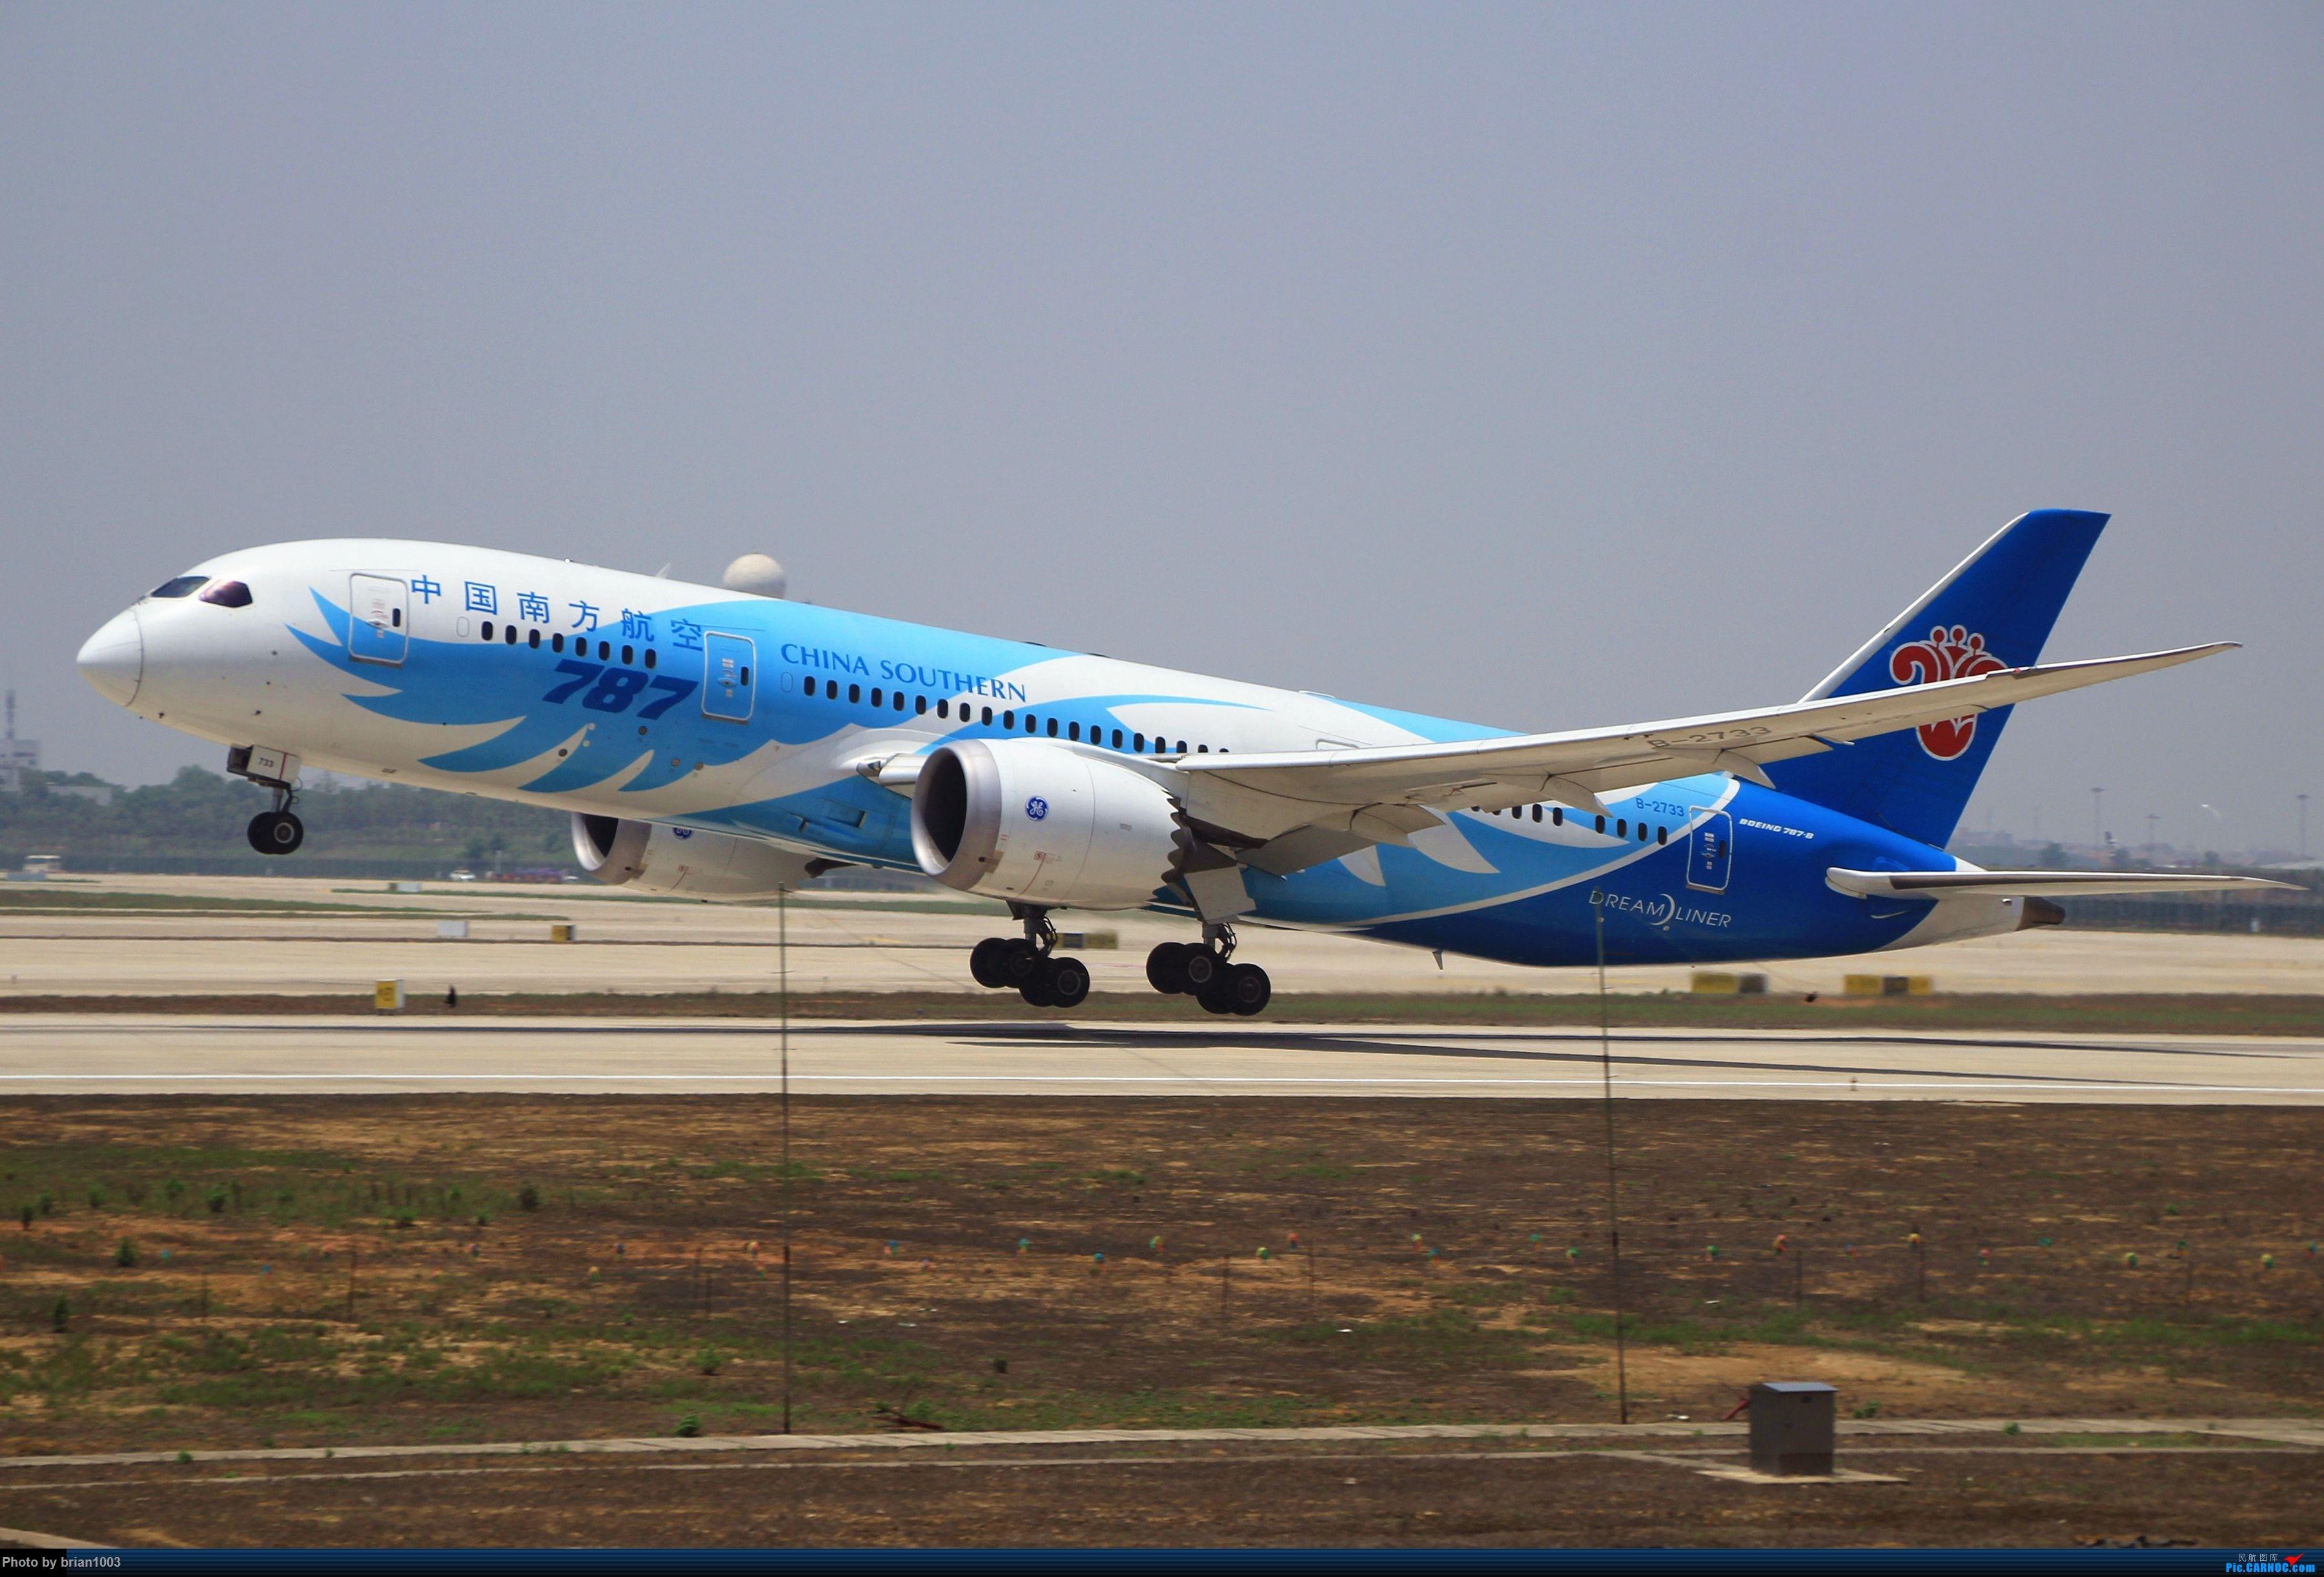 Re:[原创]WUH武汉天河机场拍机之喜迎酷航788和偶遇某其他飞机 BOEING 787-8 B-2733 WUH